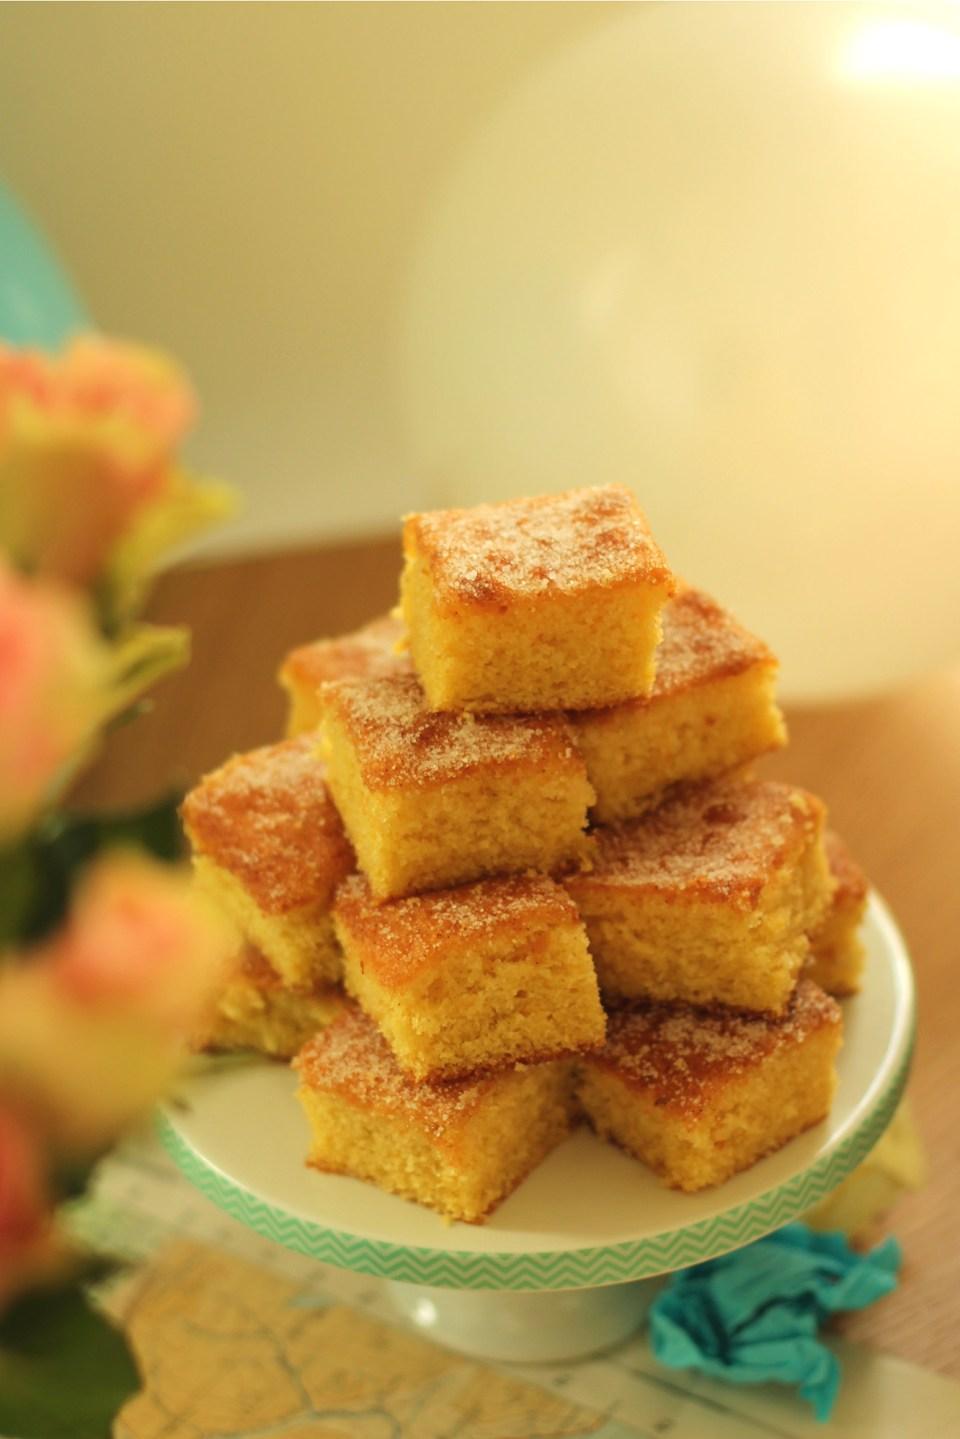 easy-lemon-drizzle-cake-recipe-08